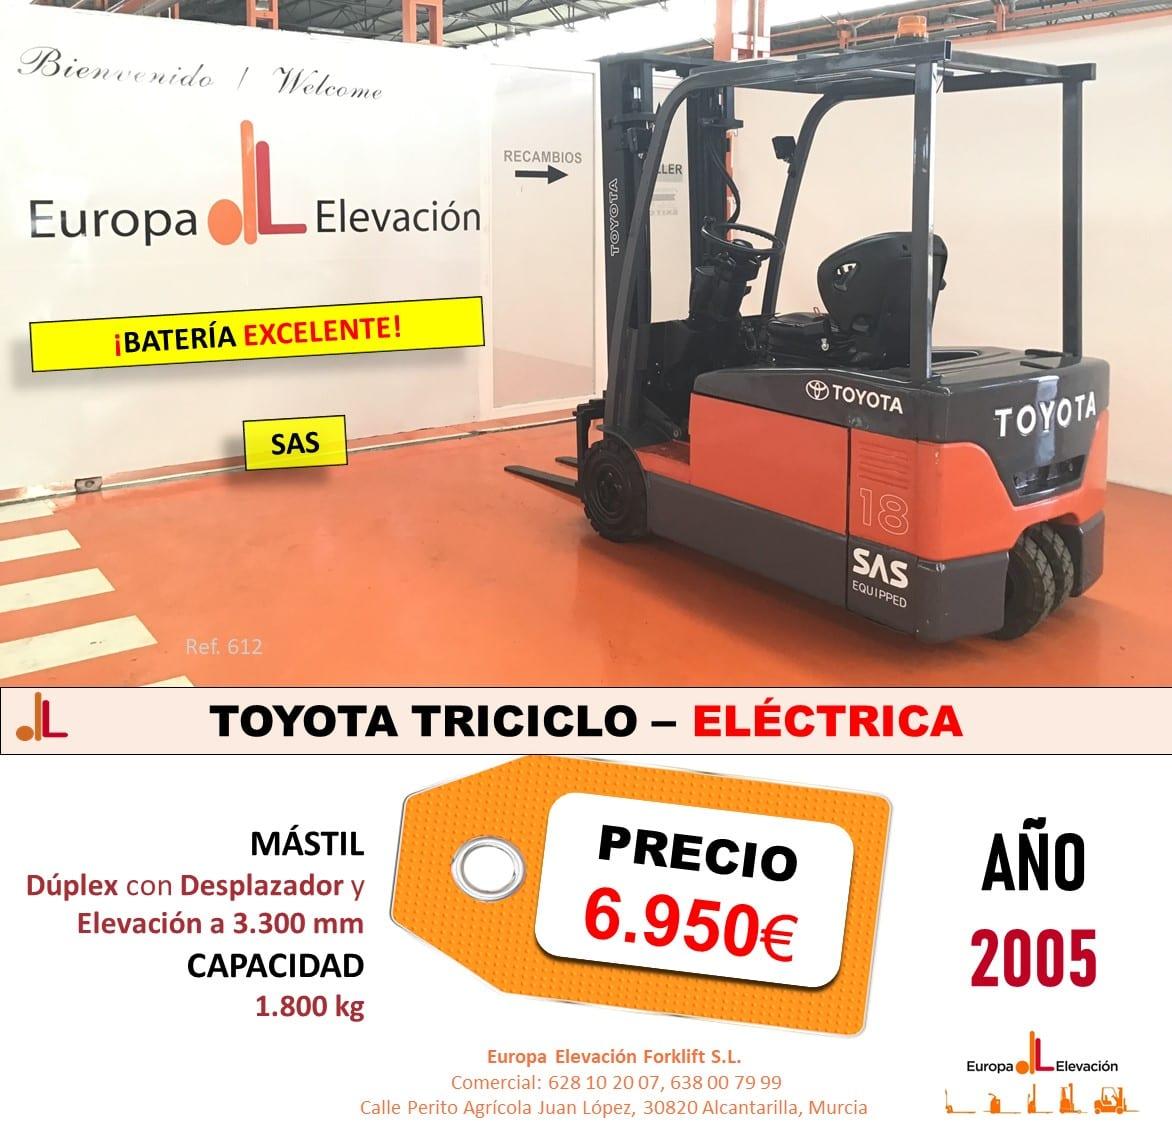 TOYOTA TRICICLO ELÉCTRICA EUROPA ELEVACION